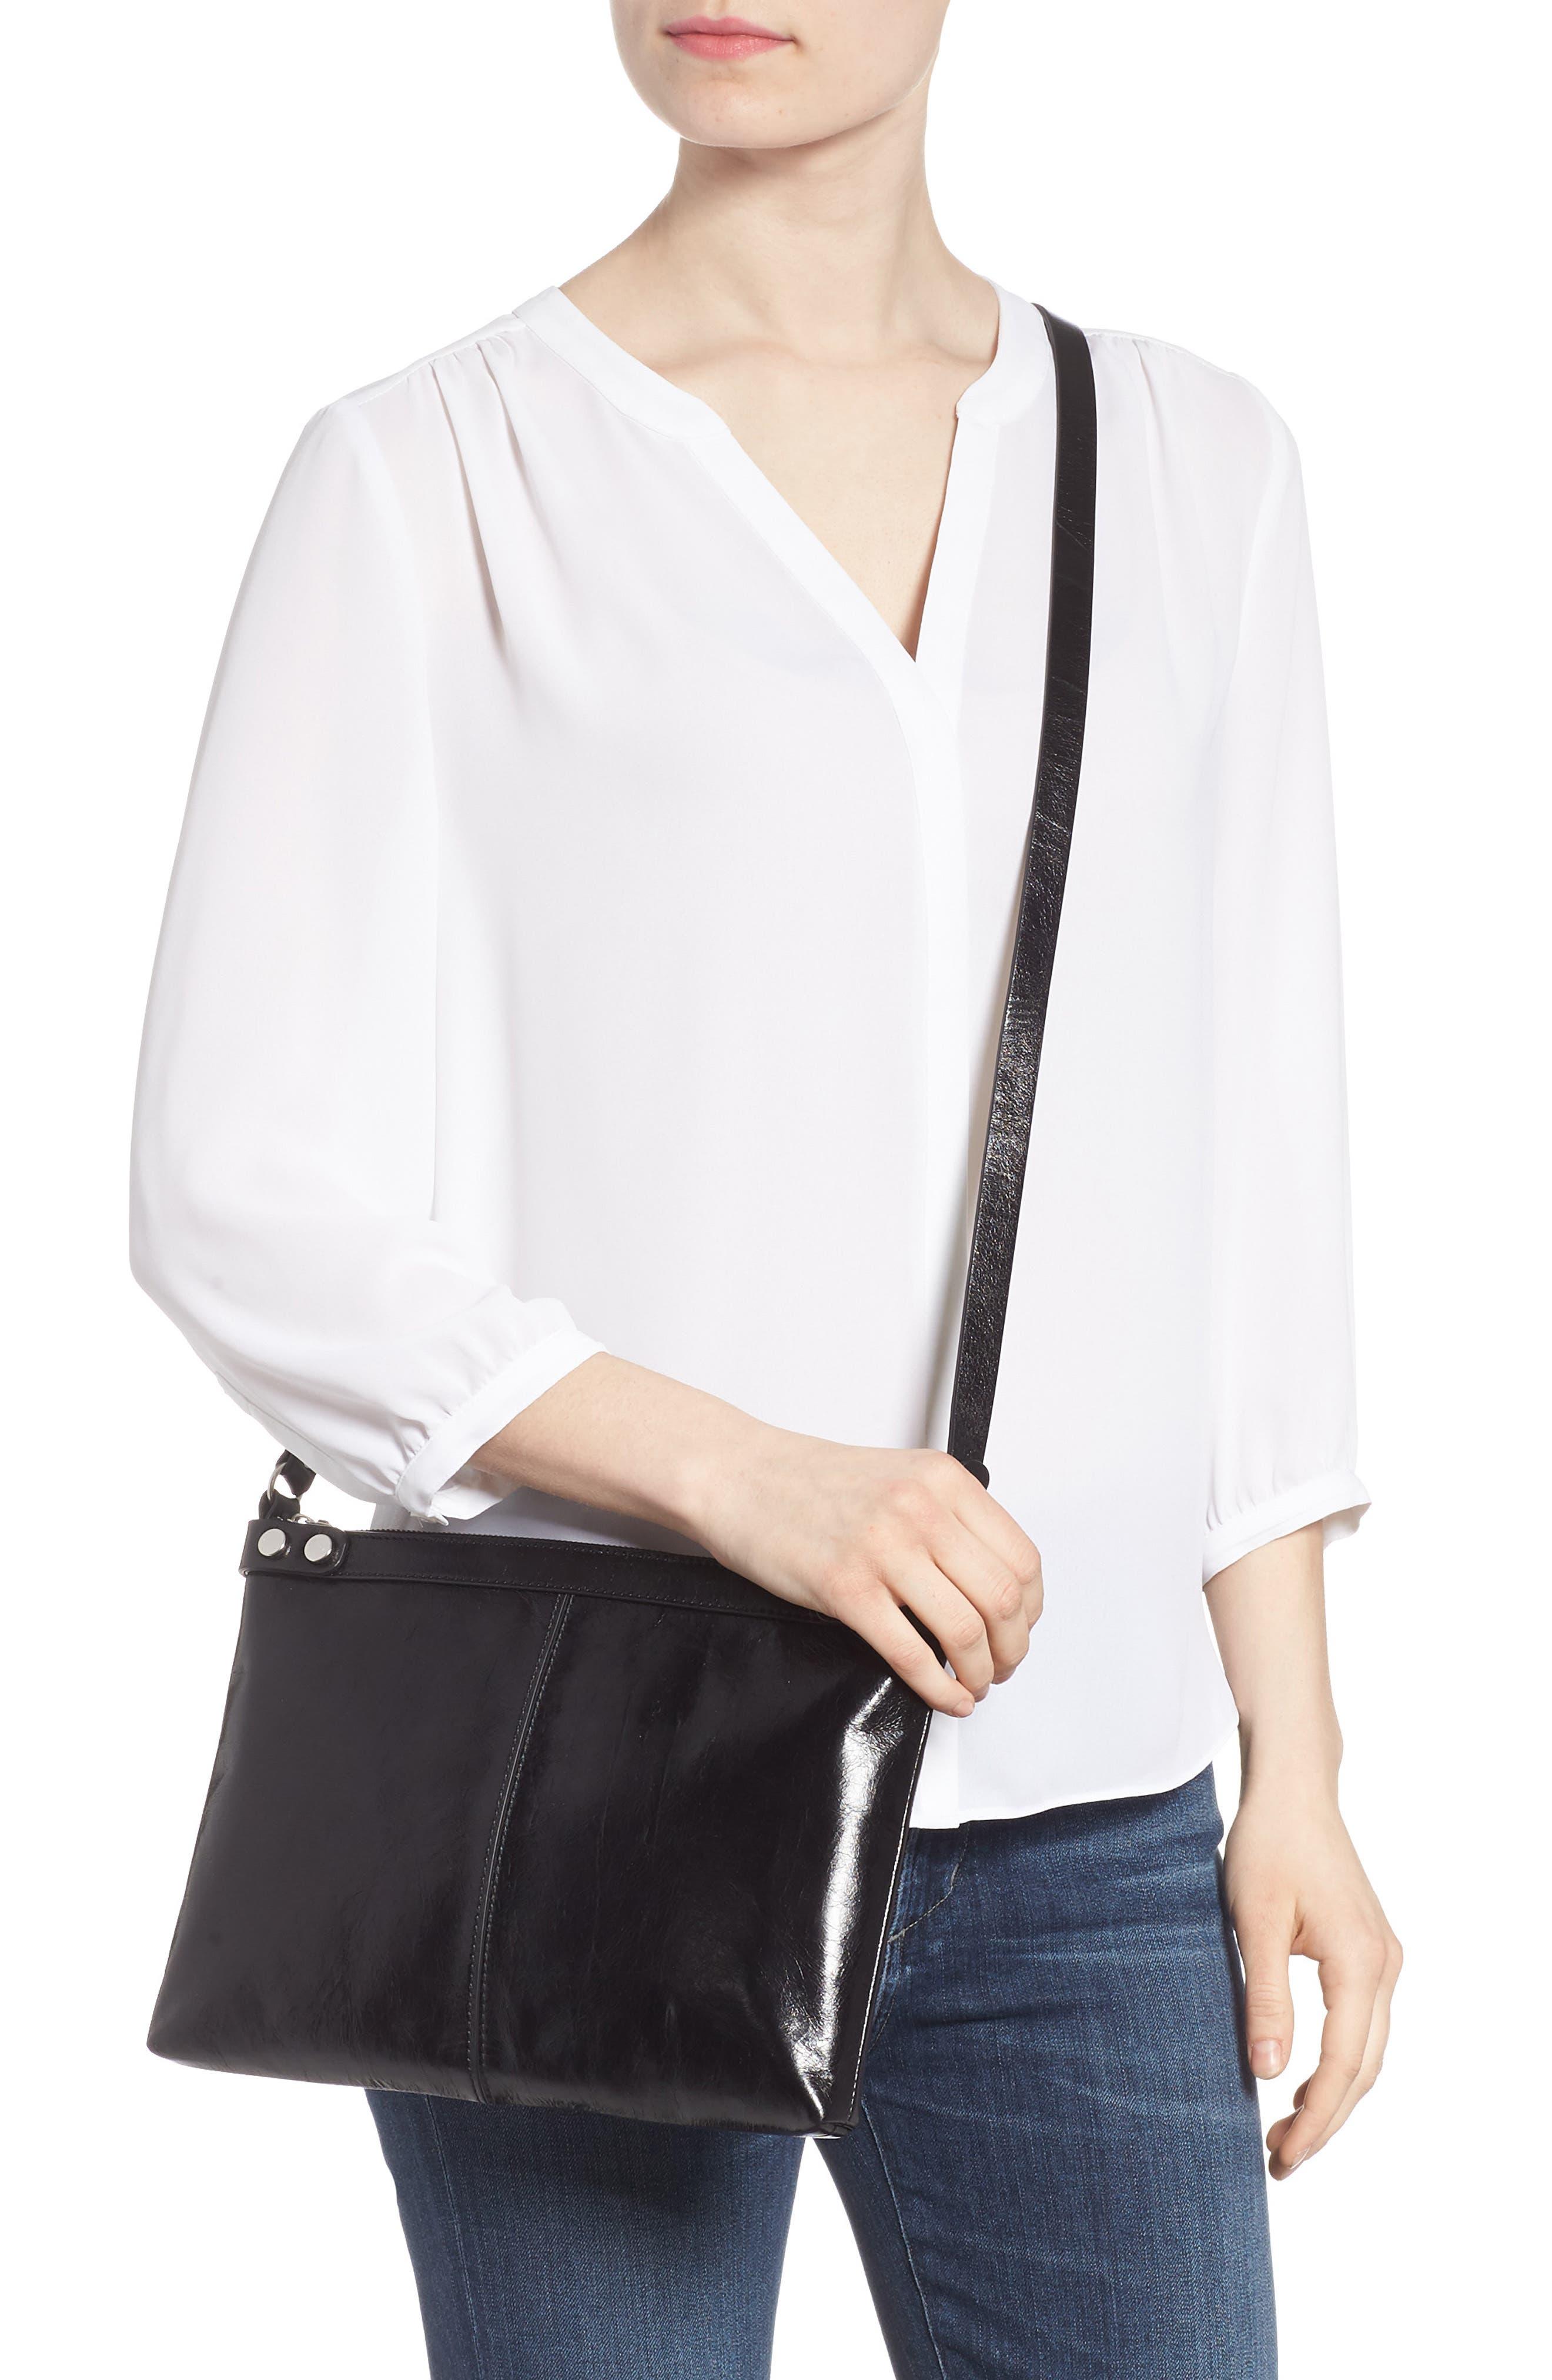 Marlow Glazed Leather Crossbody Bag,                             Alternate thumbnail 2, color,                             BLACK